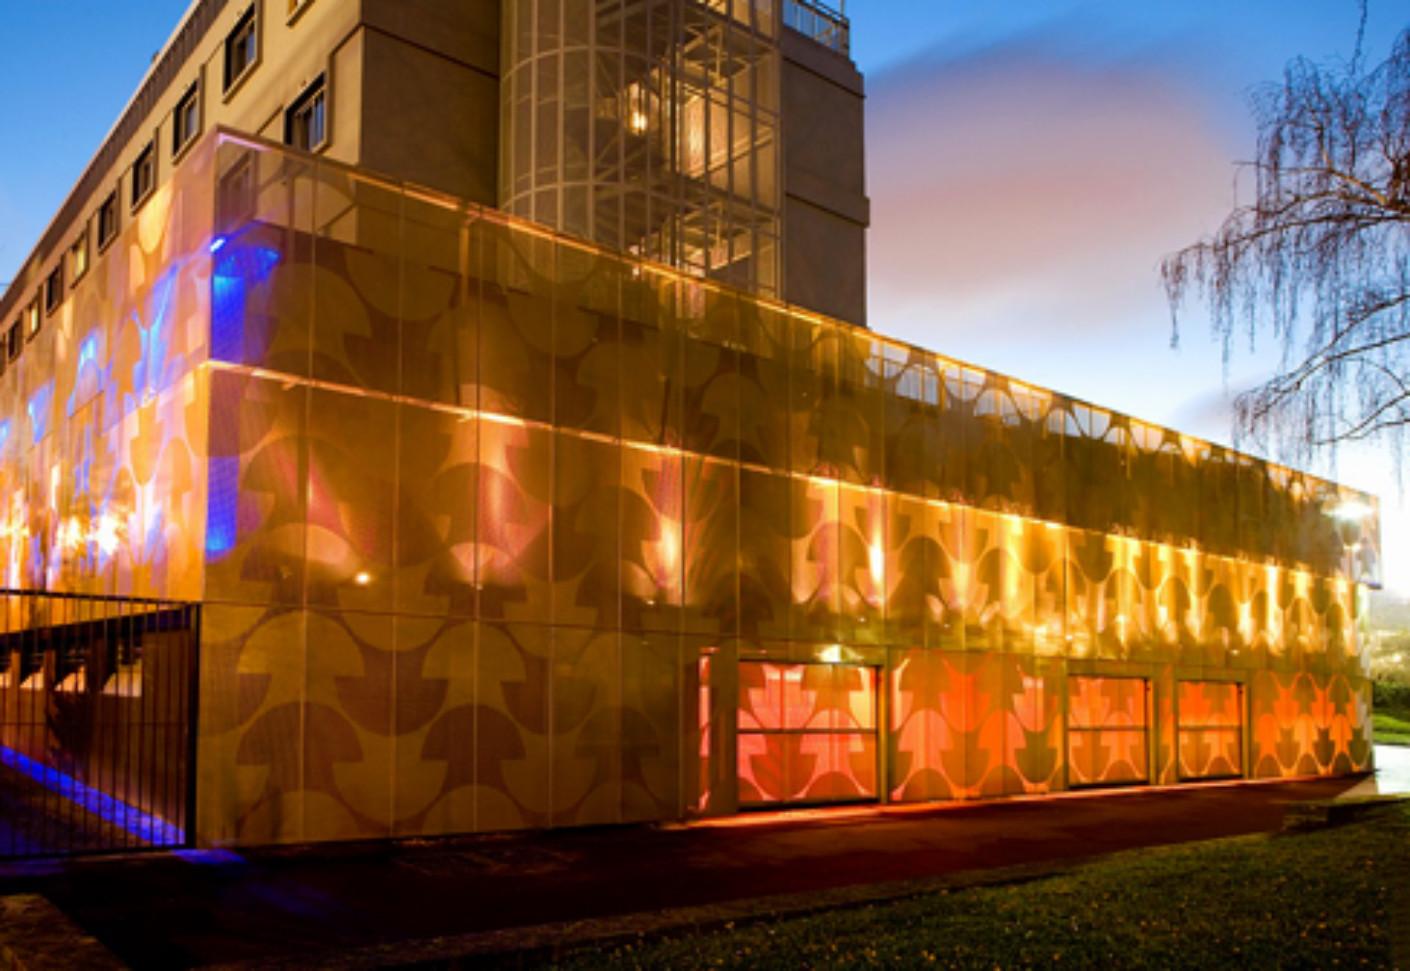 Perforated Aluminium Panels Maison Du Portugal By Rmig